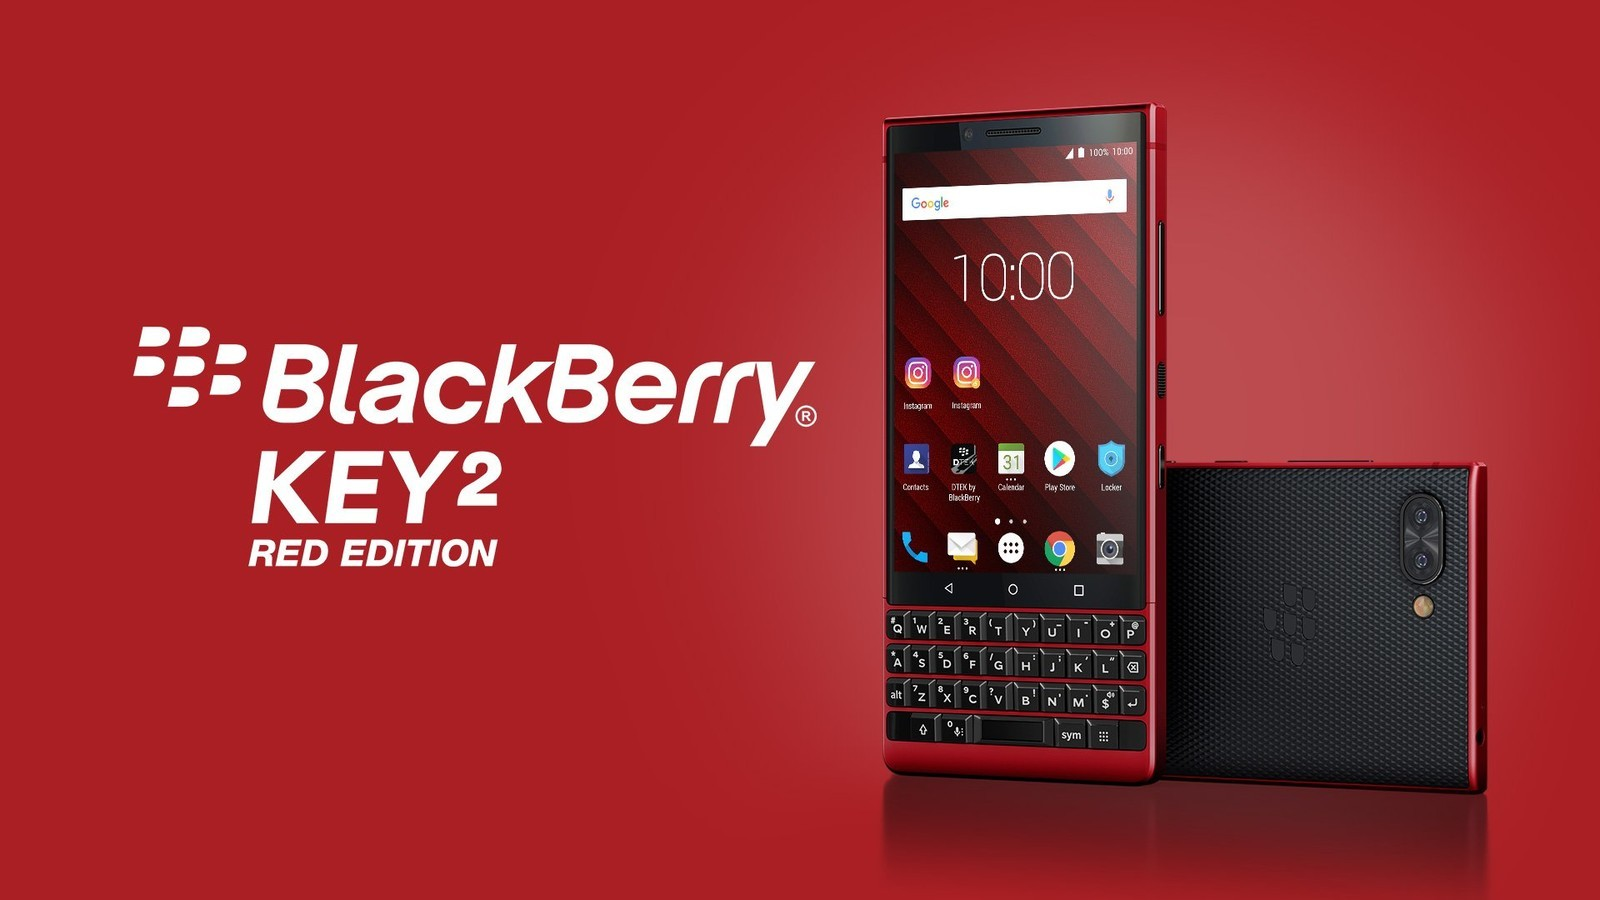 НОВОЕ ВИДЕО BLACKBERRY KEY2 RED EDITION ОТ BLACKBERRY MOBILE